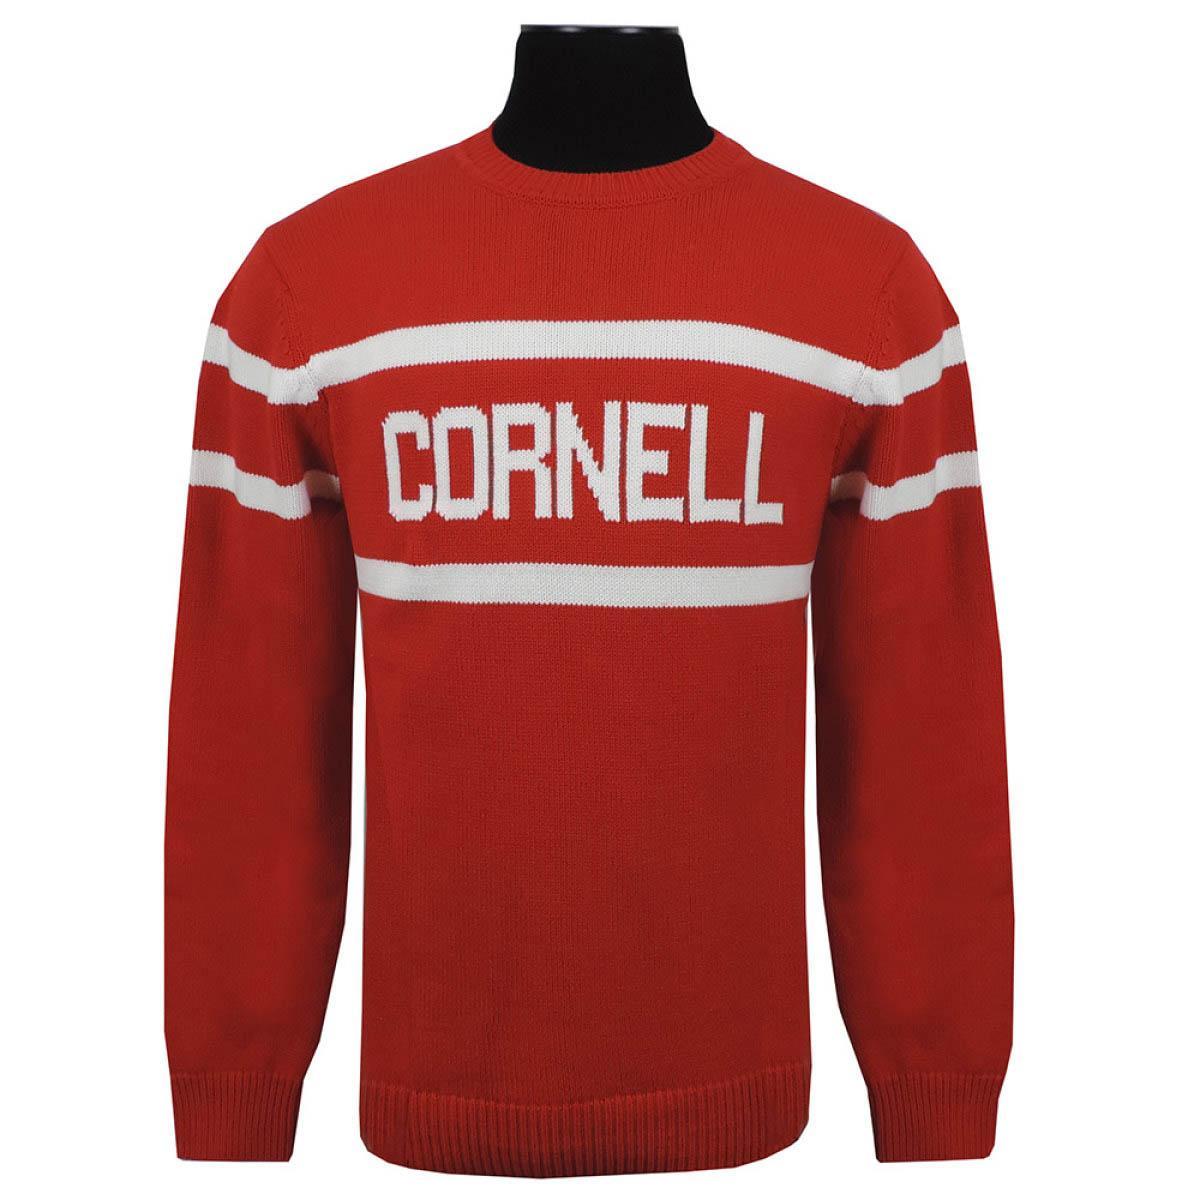 556a1d6e073 Stadium Sweater - Red